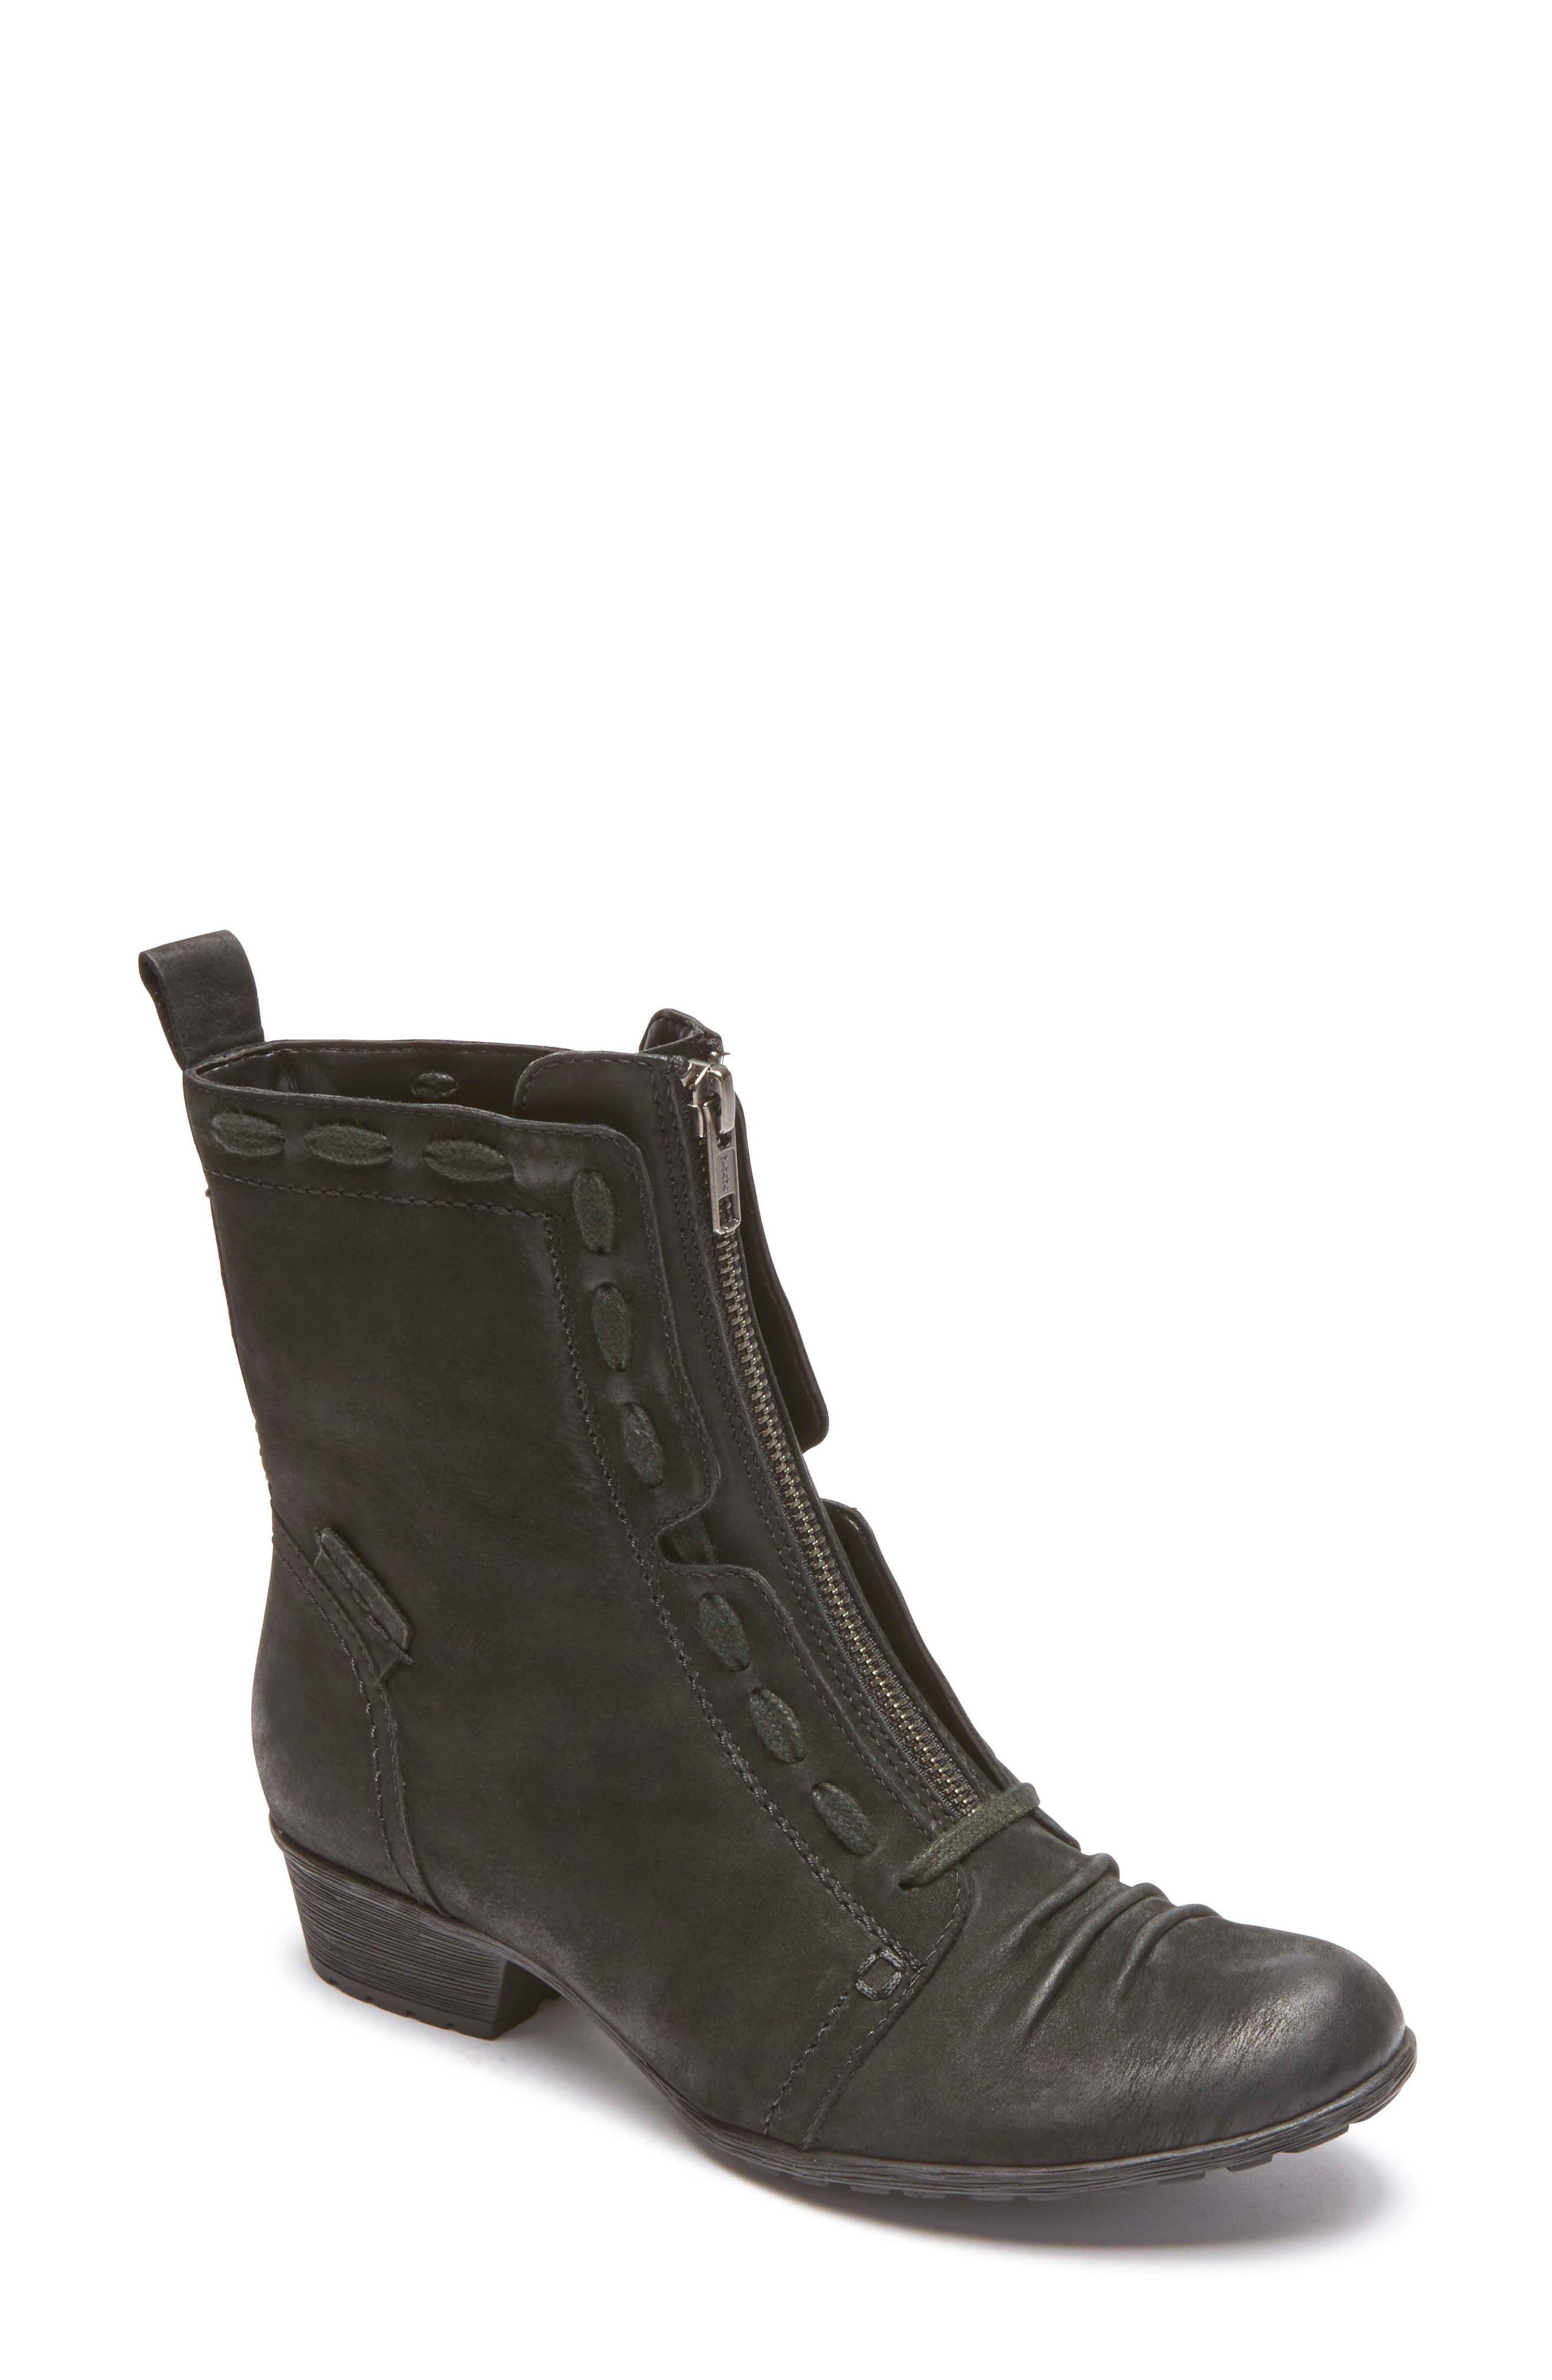 Gratasha Front Zip Boot,                             Main thumbnail 1, color,                             BLACK NUBUCK